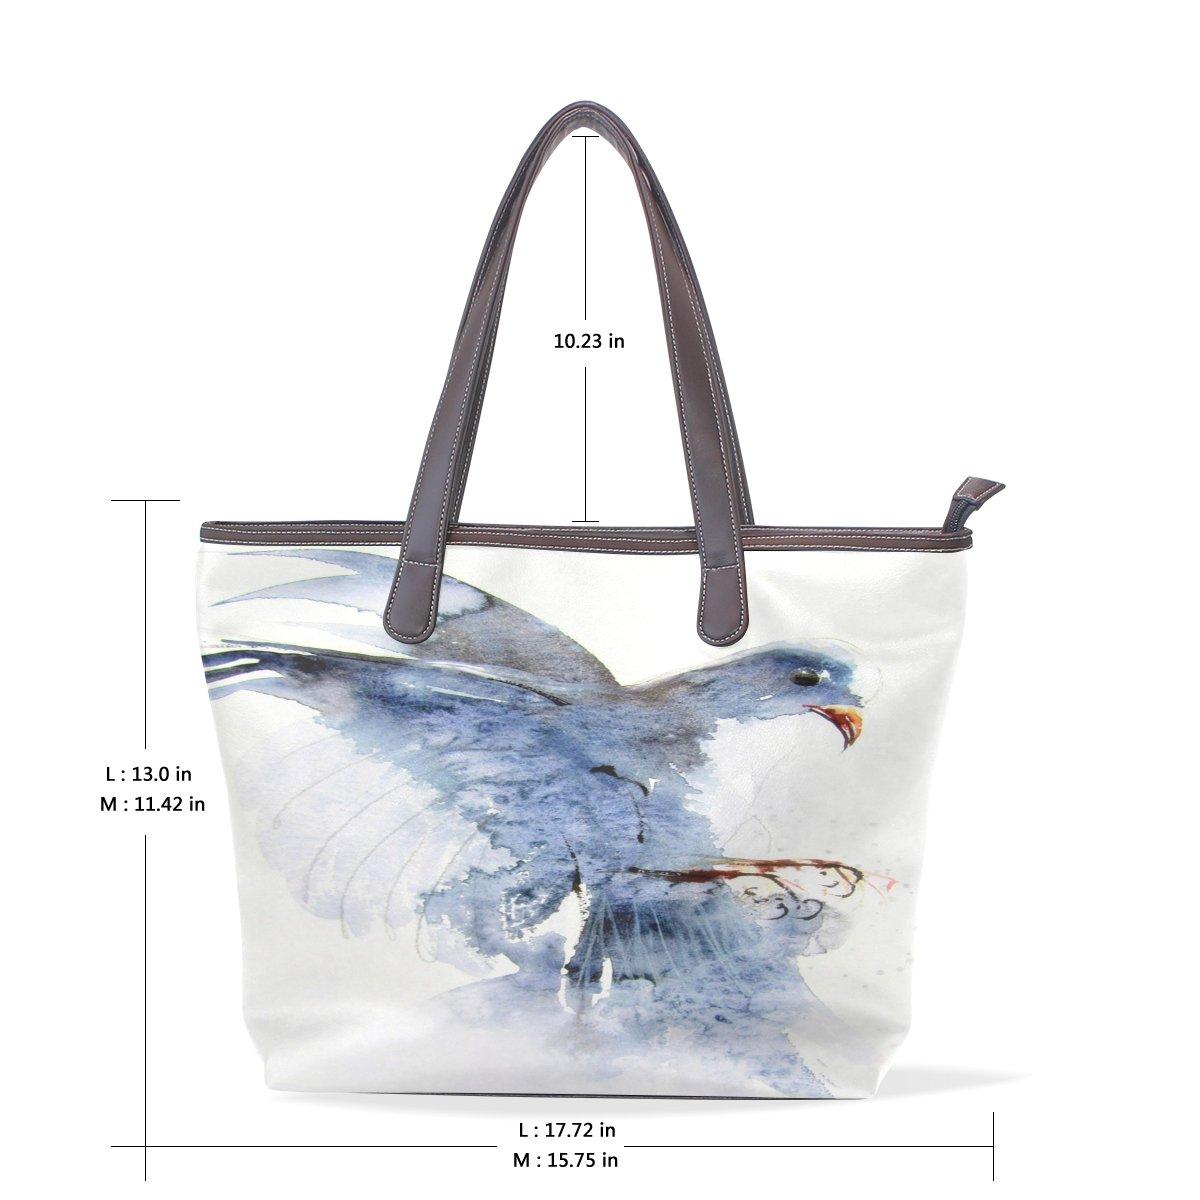 Ye Store Fly The Blue Jays Lady PU Leather Handbag Tote Bag Shoulder Bag Shopping Bag